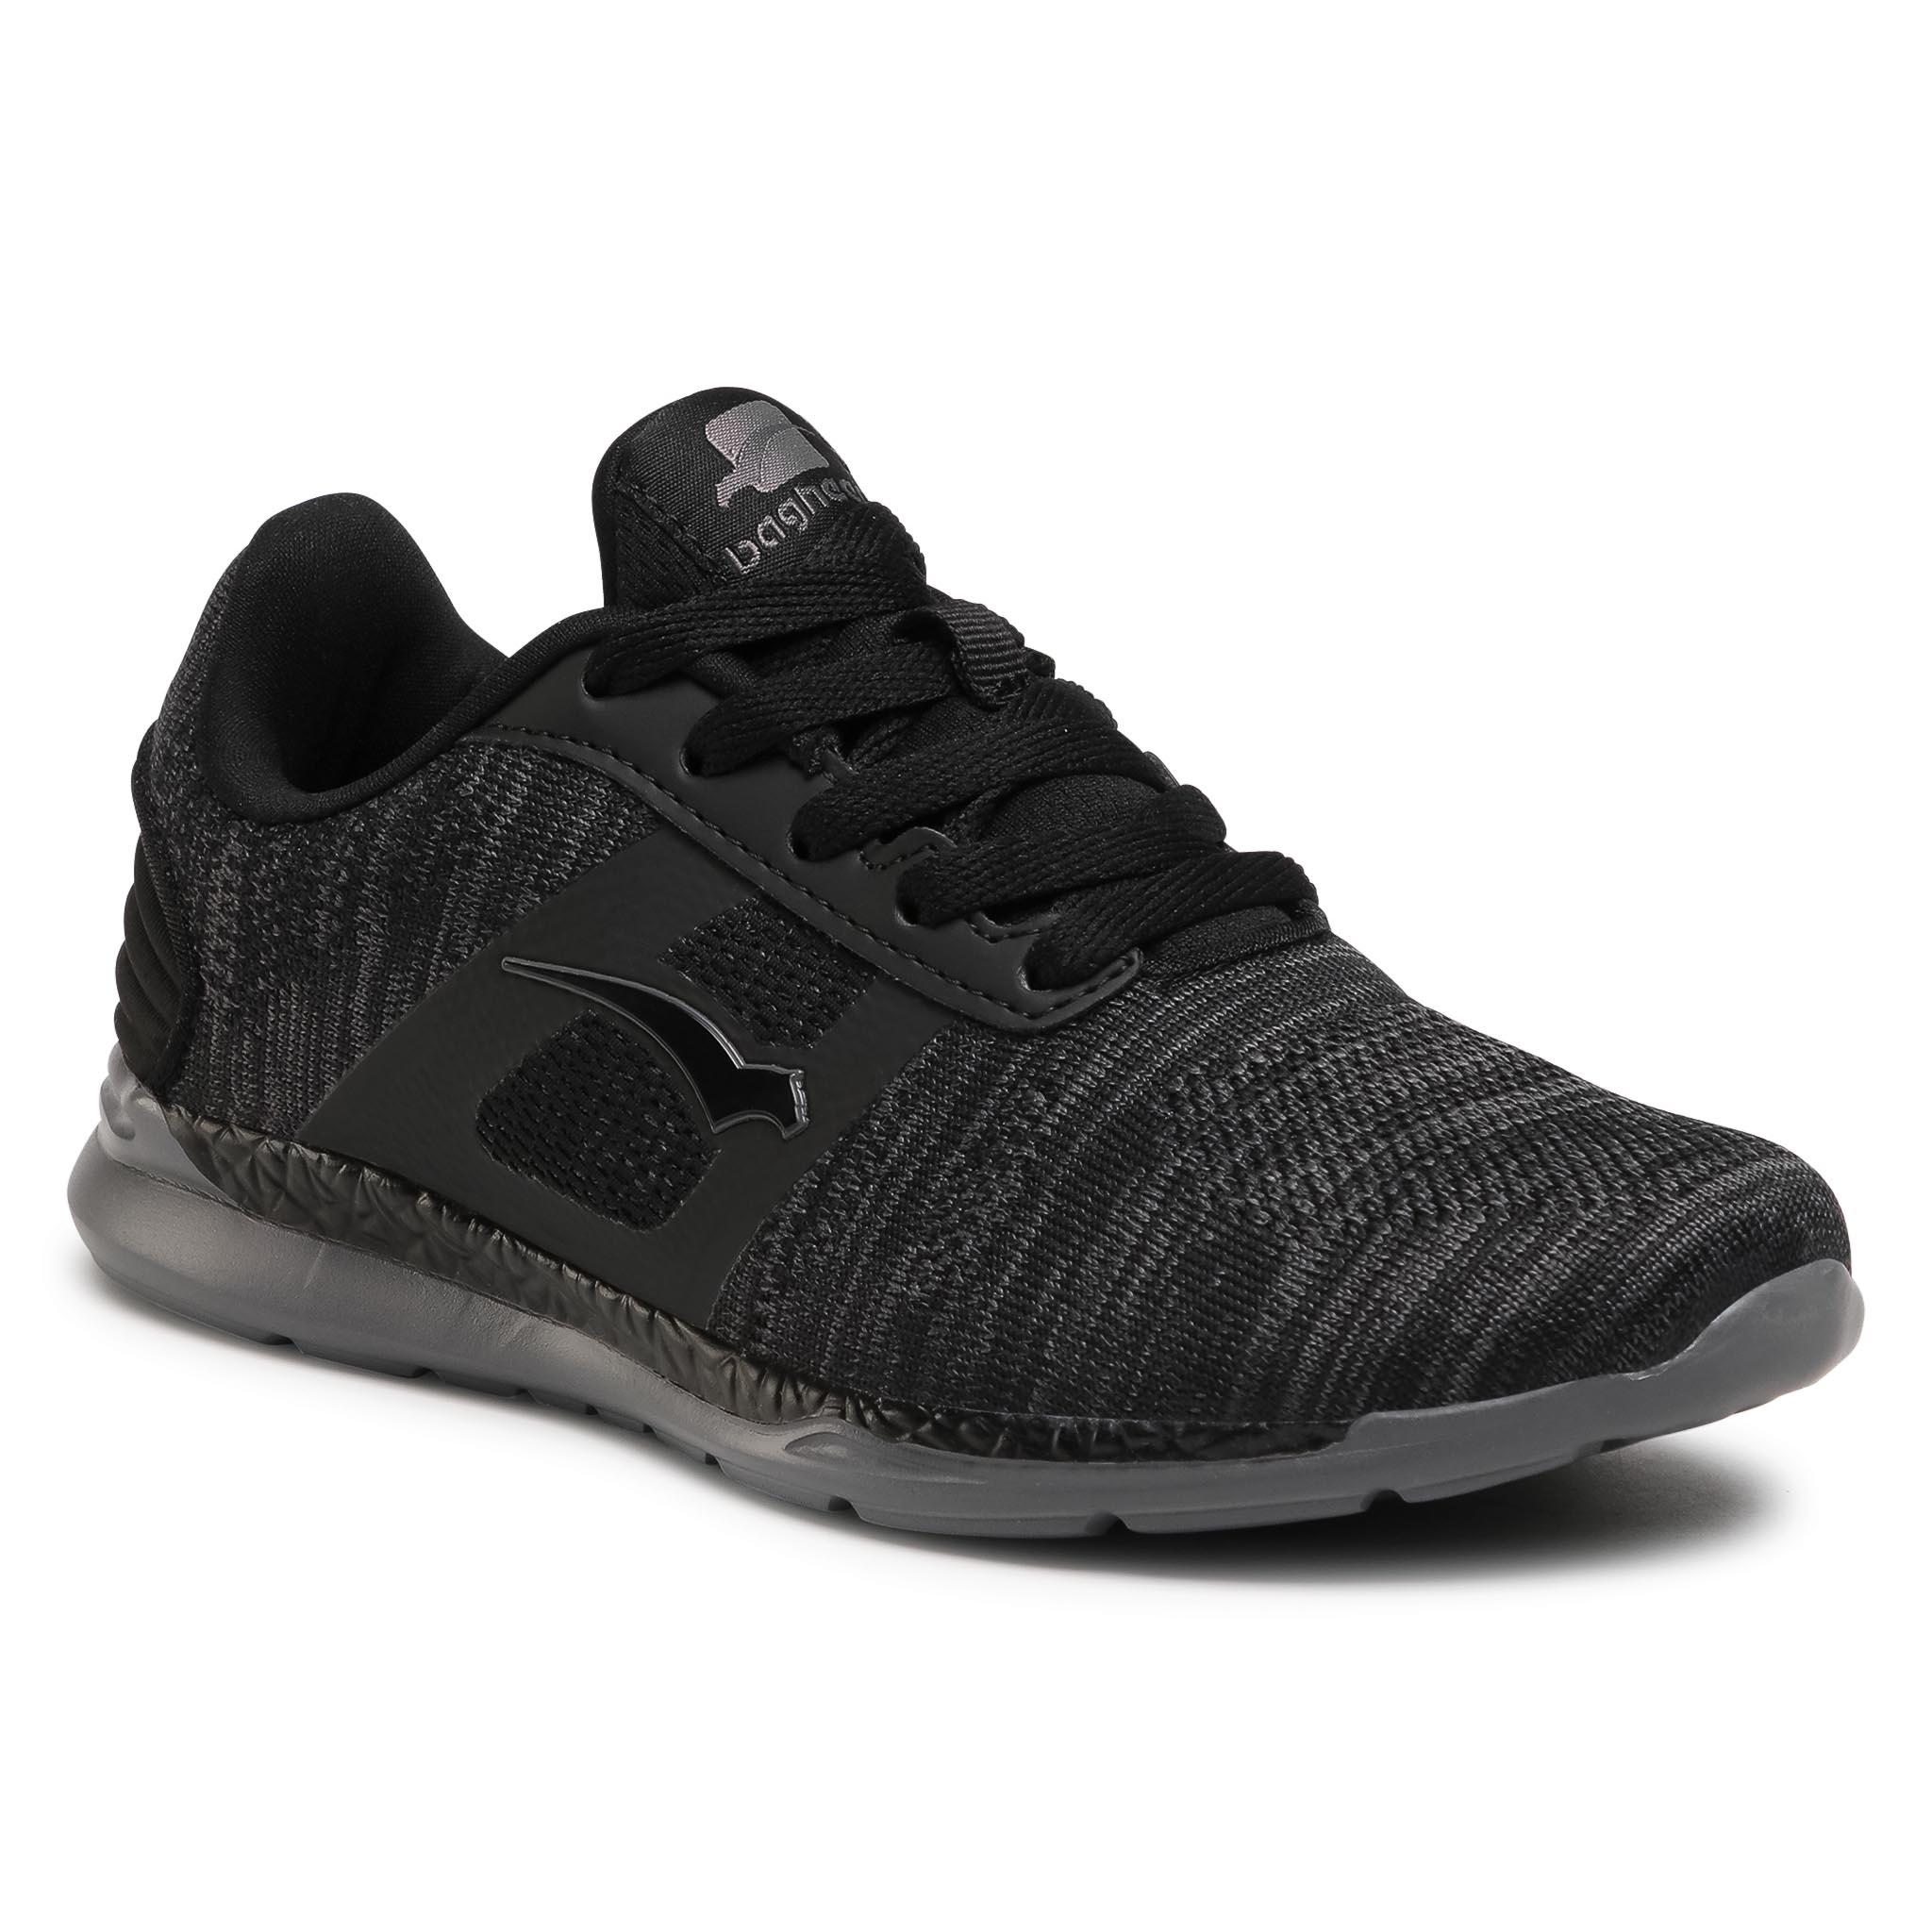 Image of Schuhe BAGHEERA - Core 86430-2 C0102 Black/Dark Grey